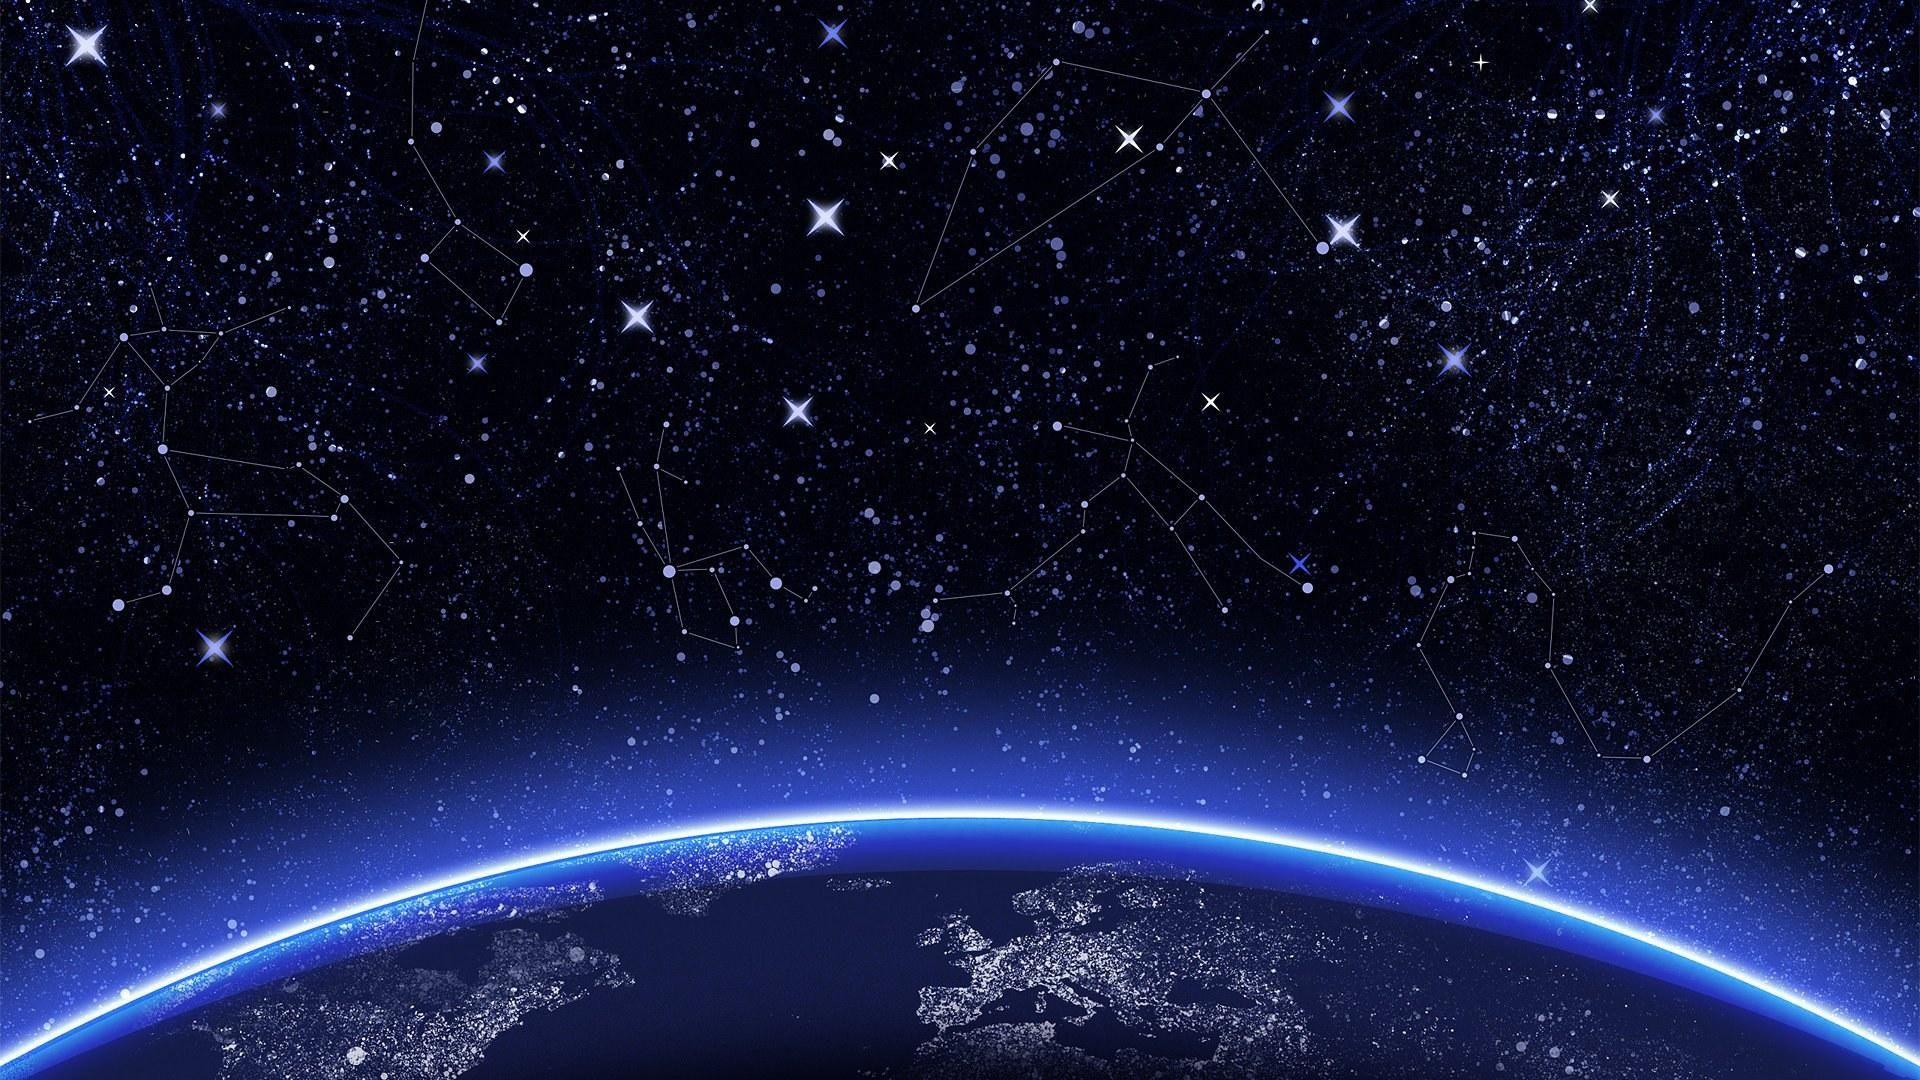 Astronomy desktop